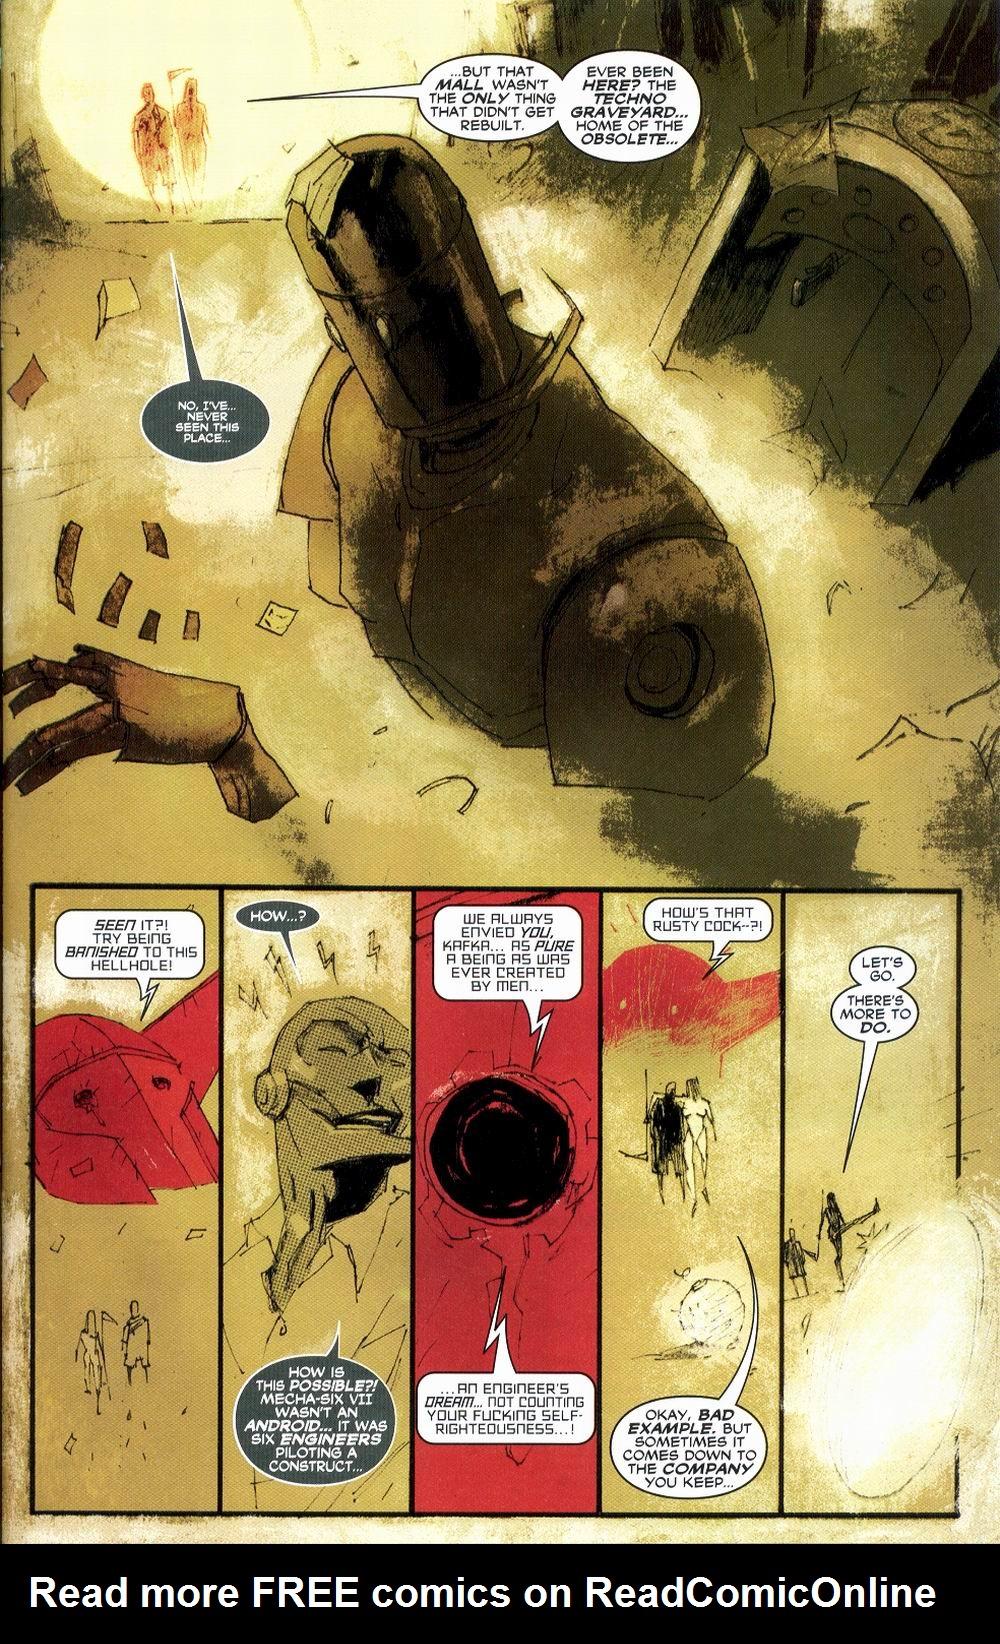 Read online Automatic Kafka comic -  Issue #1 - 18